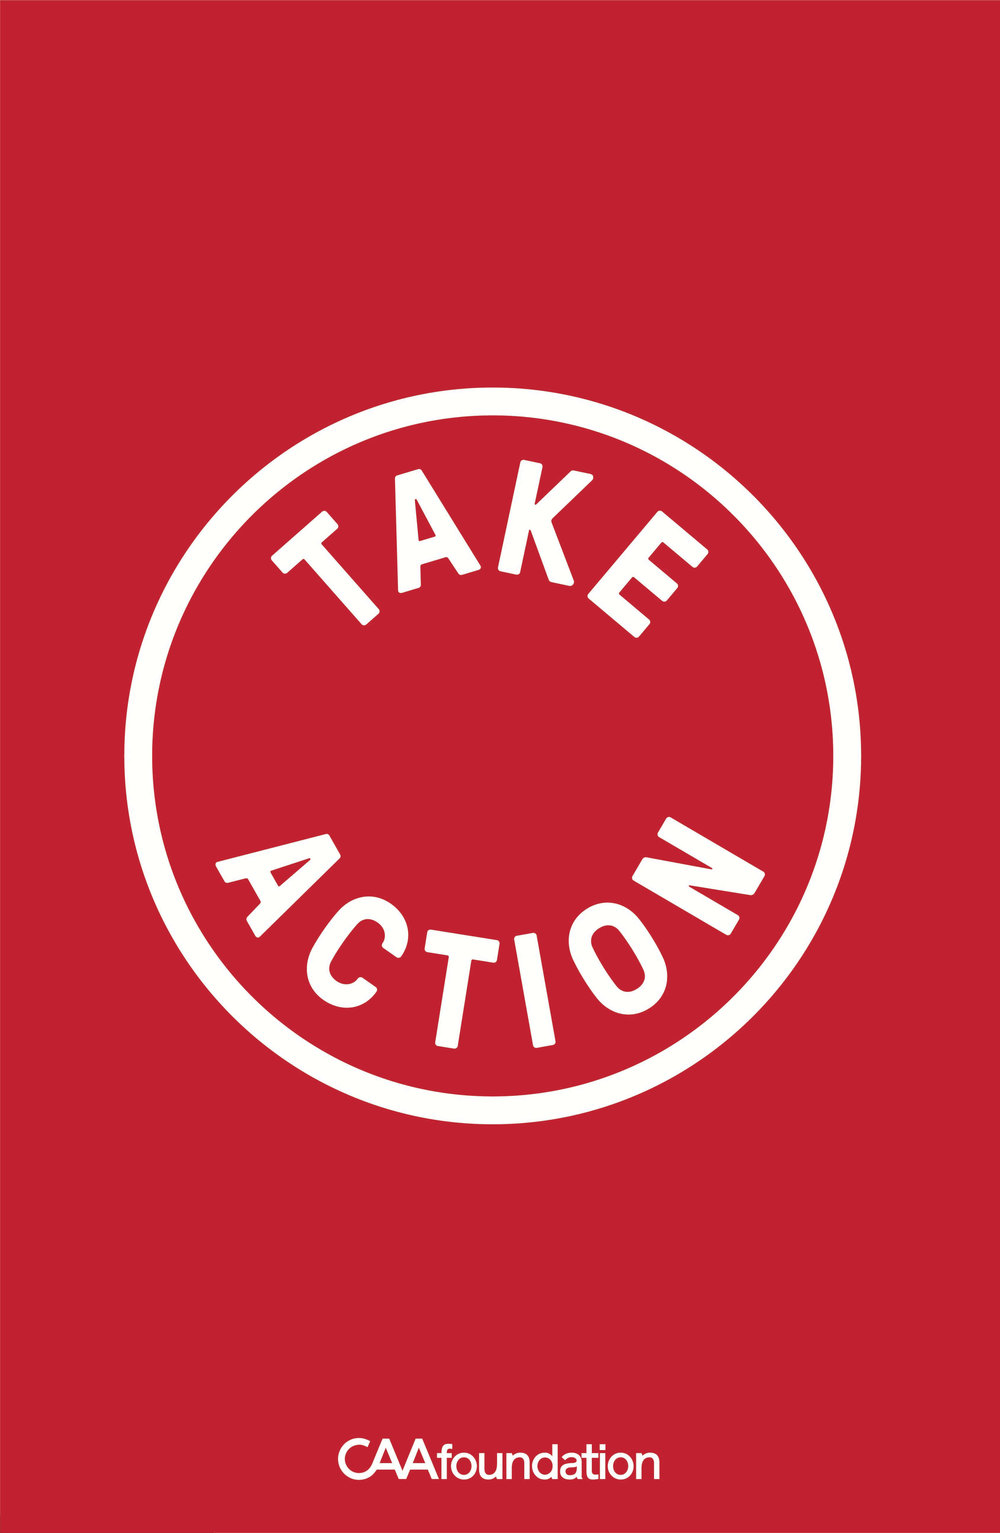 Take_Action_Posters_v5-03.jpg